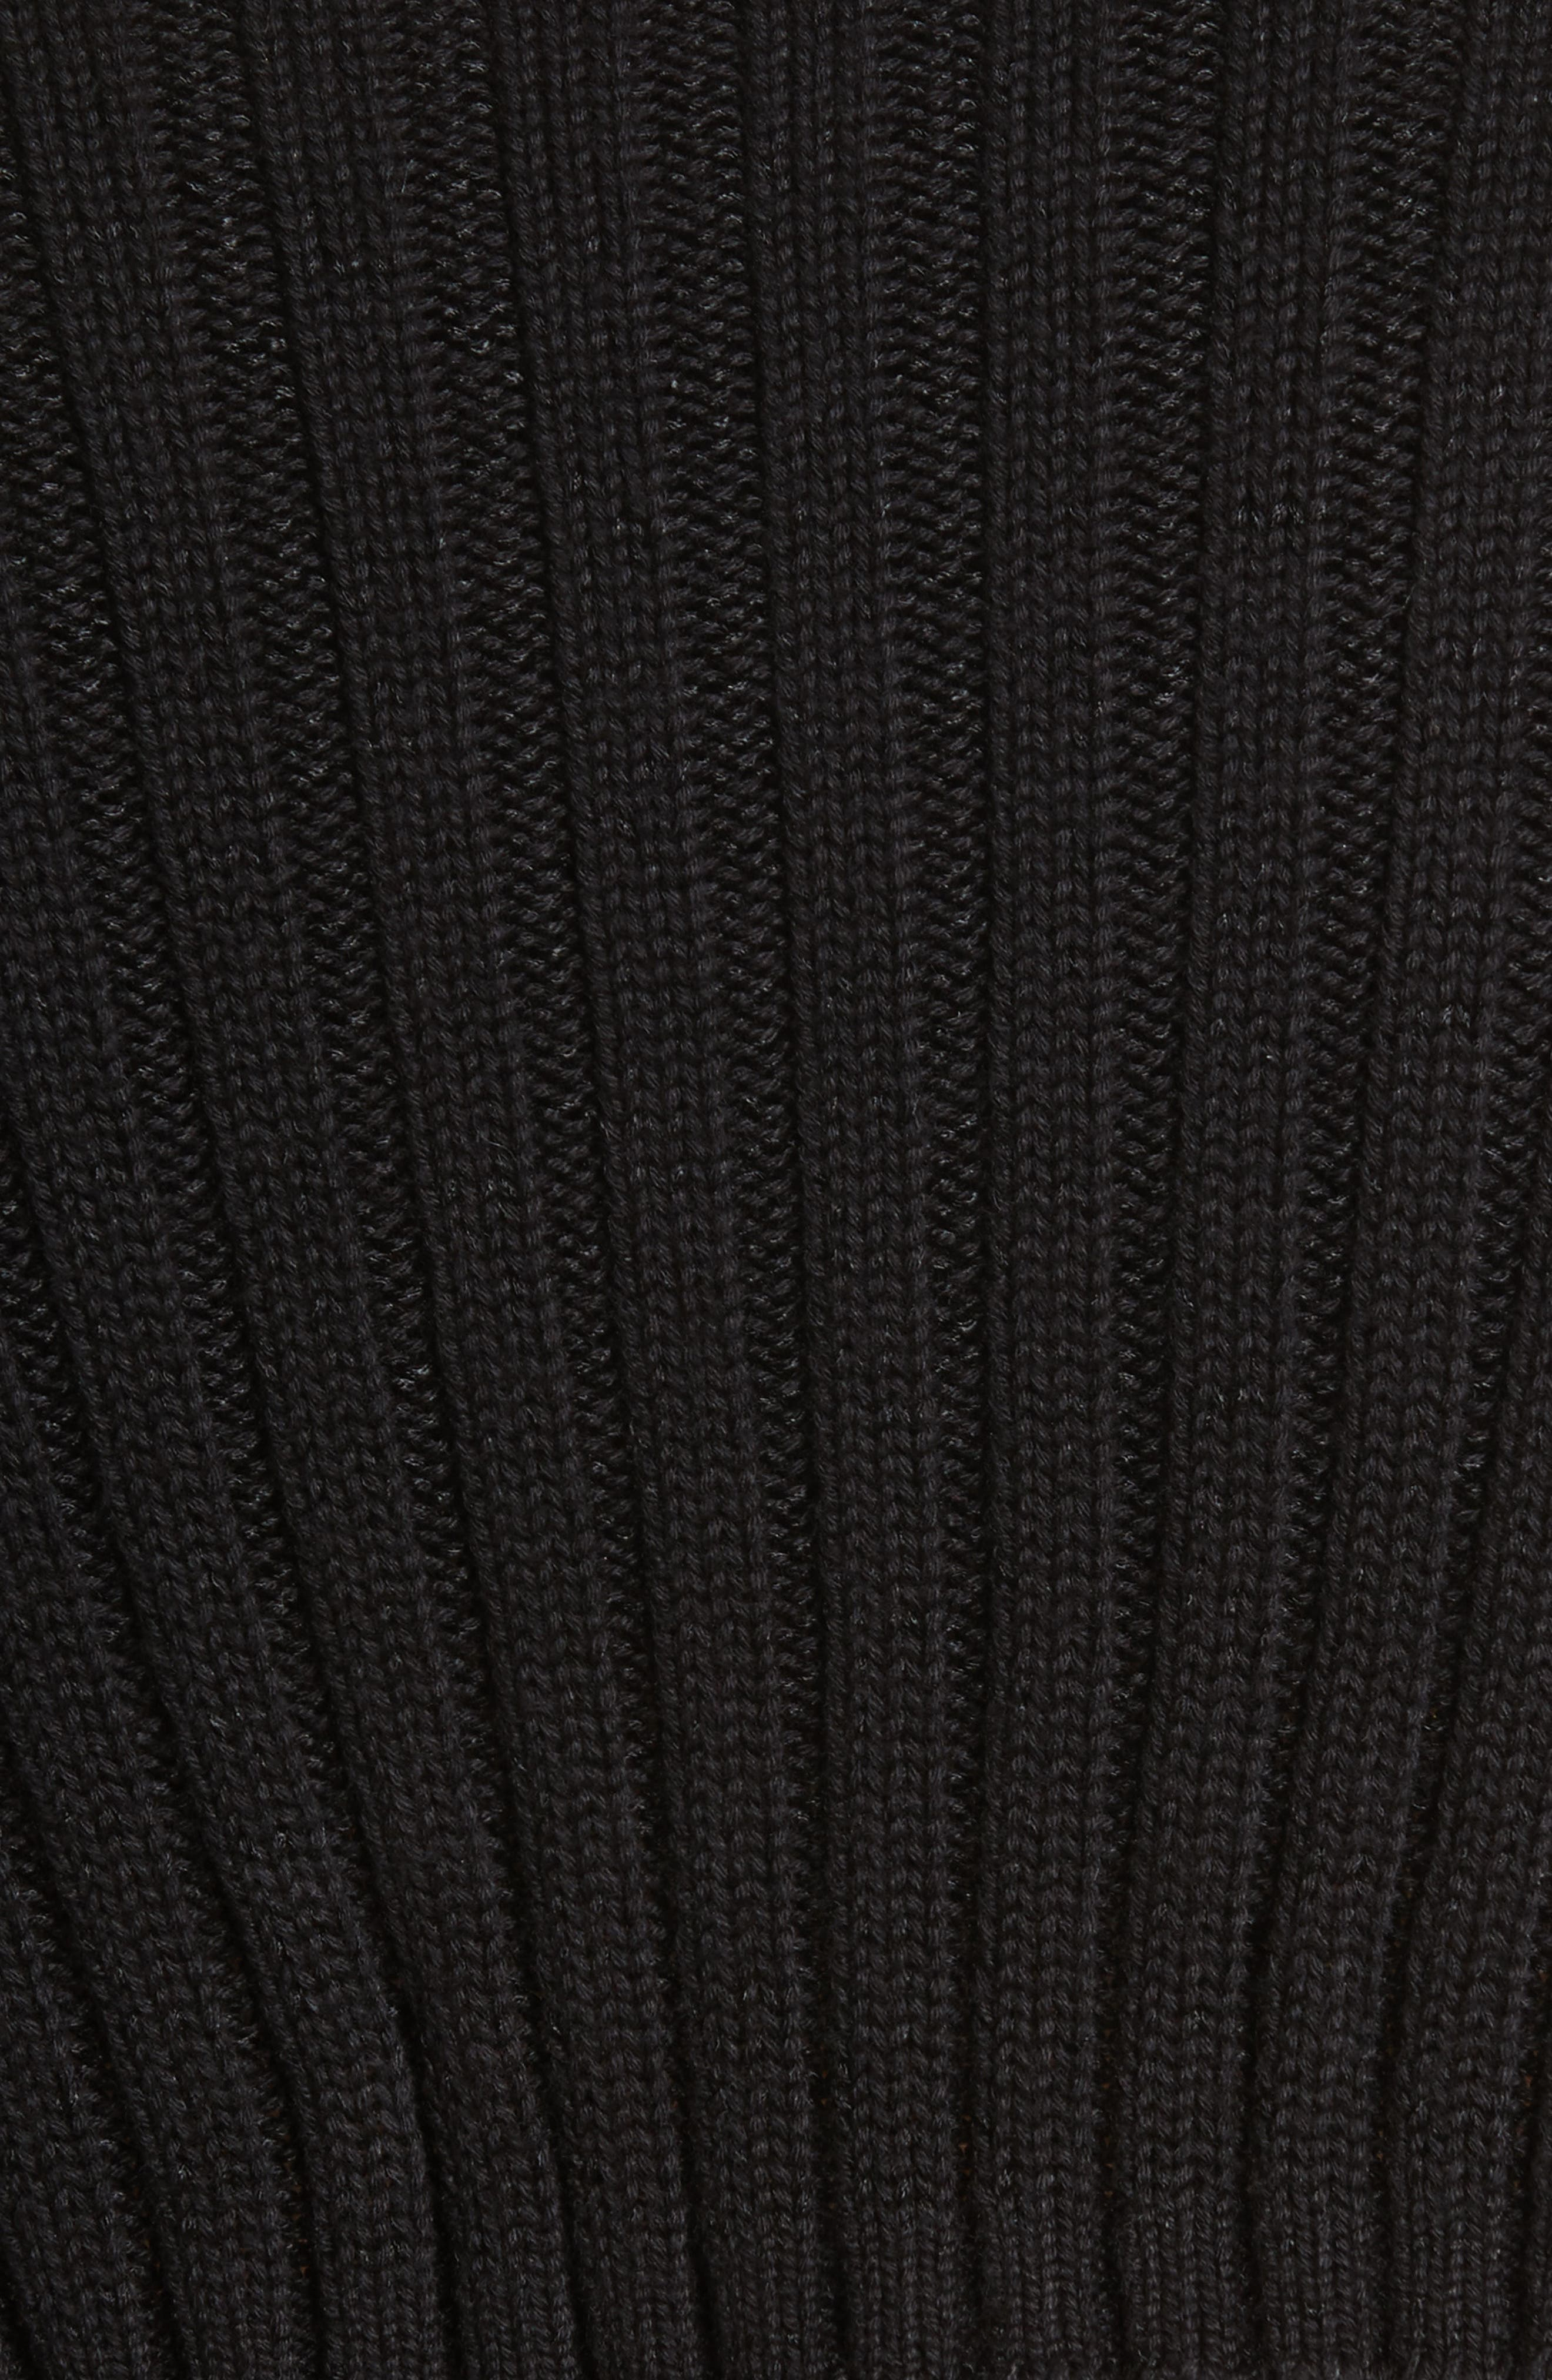 Rib Knit Cold Shoulder Dress,                             Alternate thumbnail 6, color,                             Black